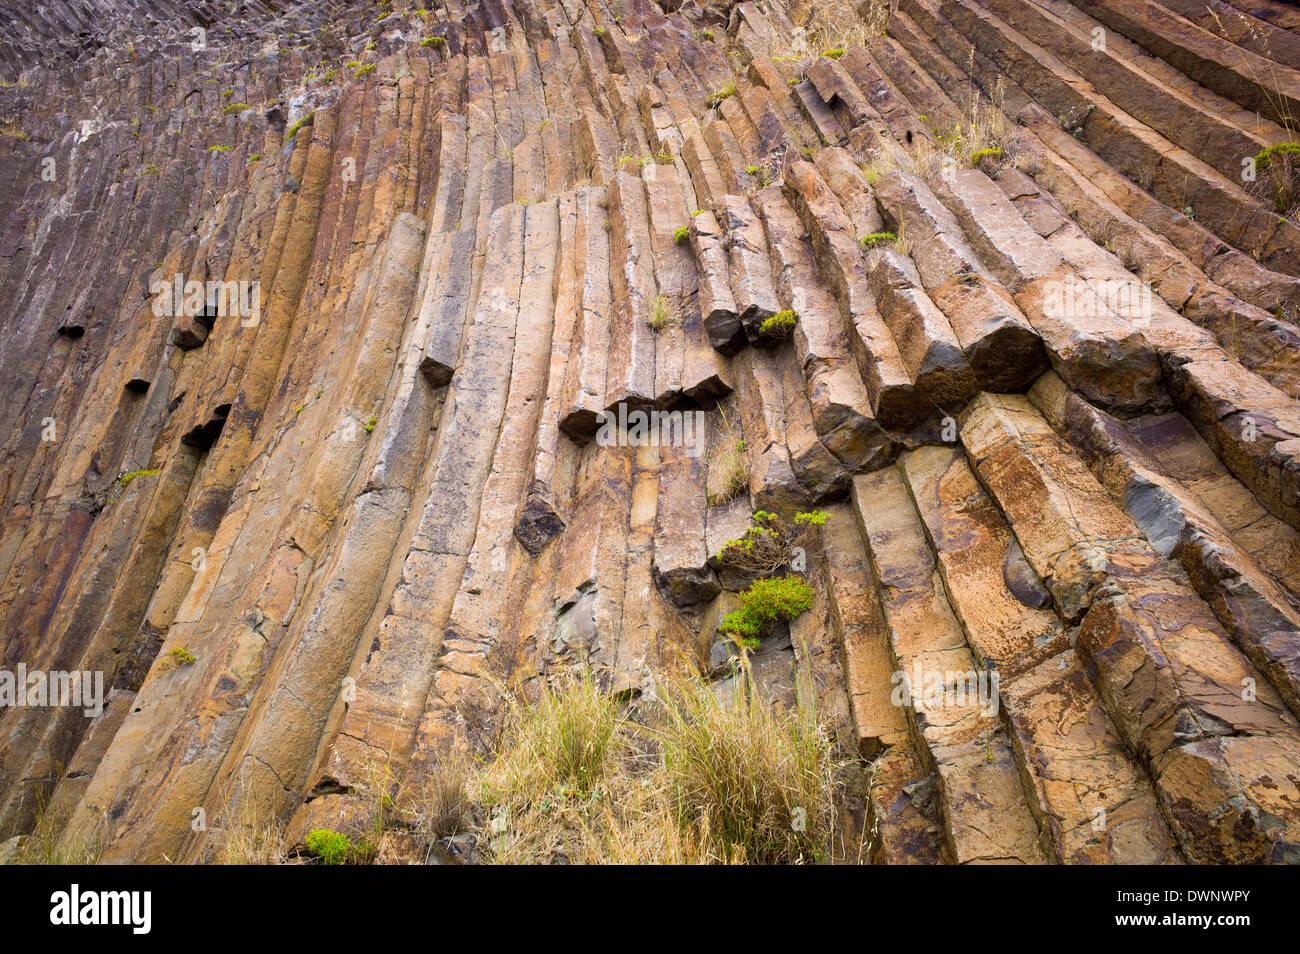 Basalt columns, Lapeiras, Porto Santo, Madeira, Portugal - Stock Image